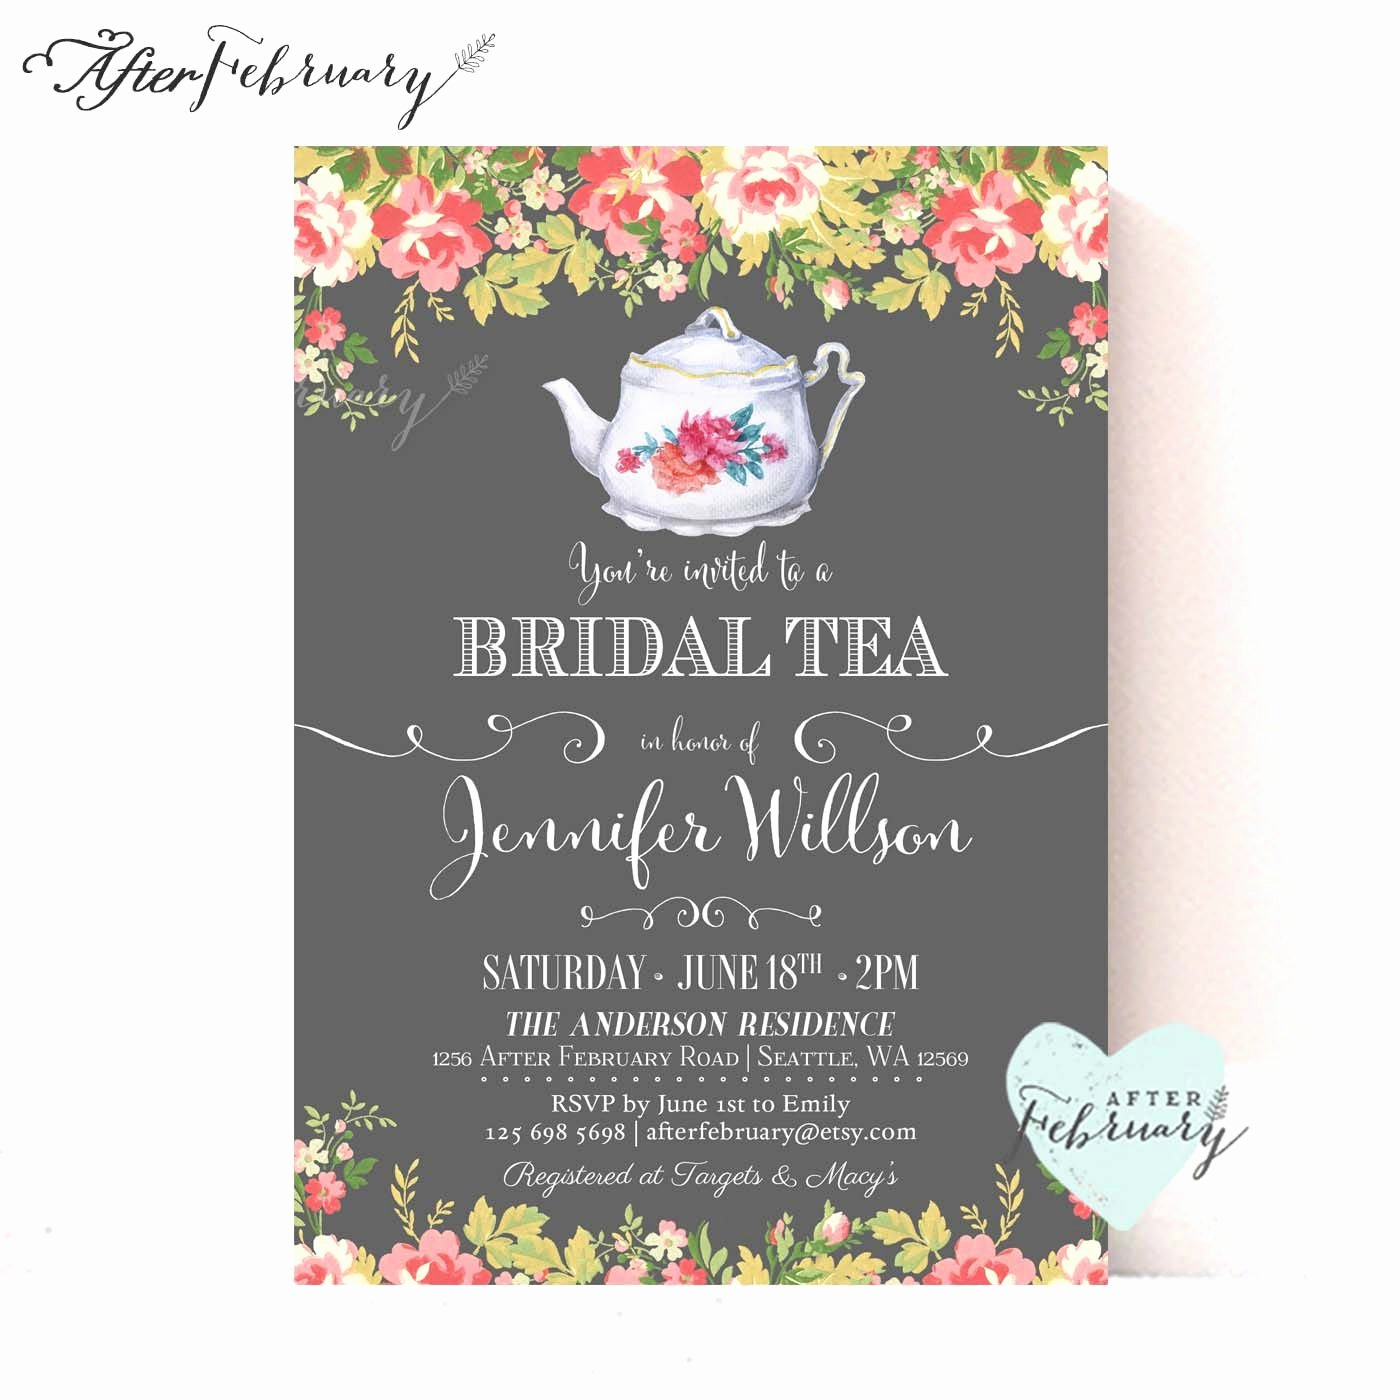 Bridal Shower Invite Bridal Shower Invite Wording Card